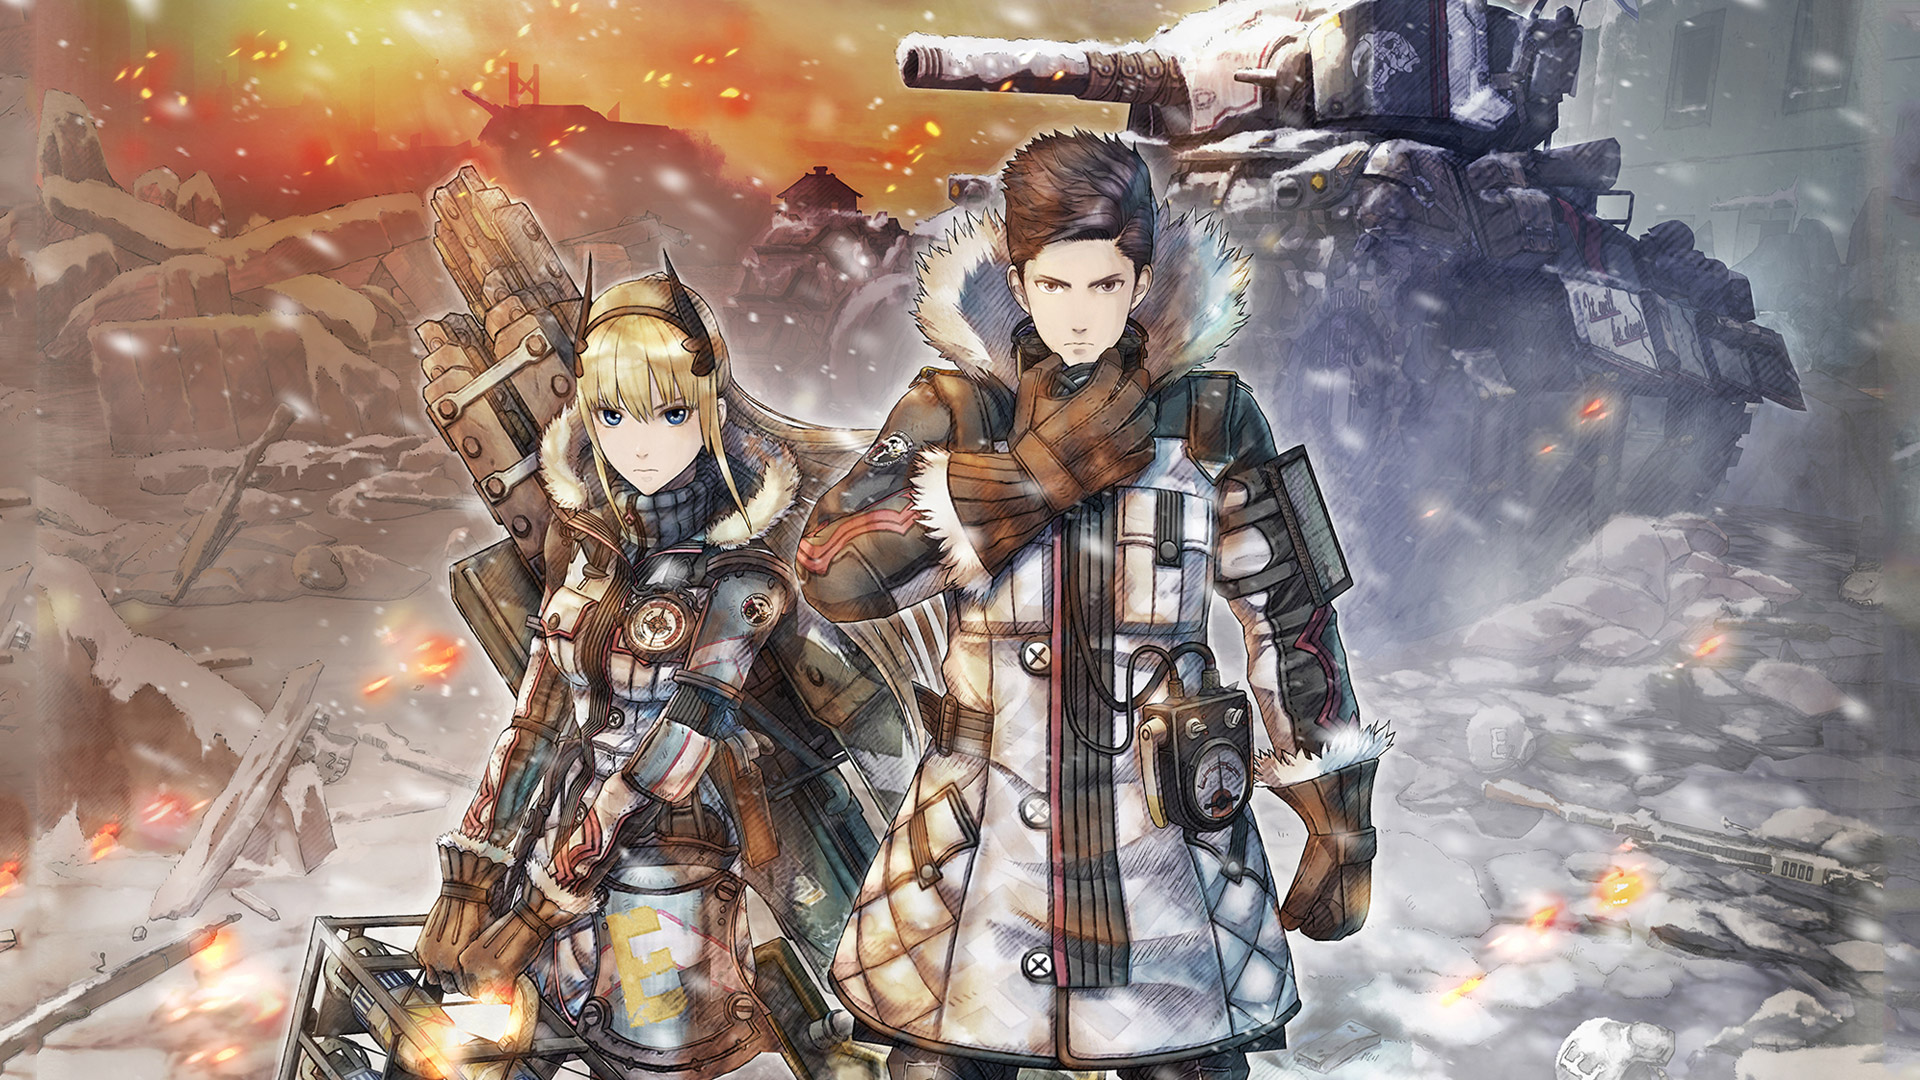 Первый геймплей Valkyria Chronicles 4